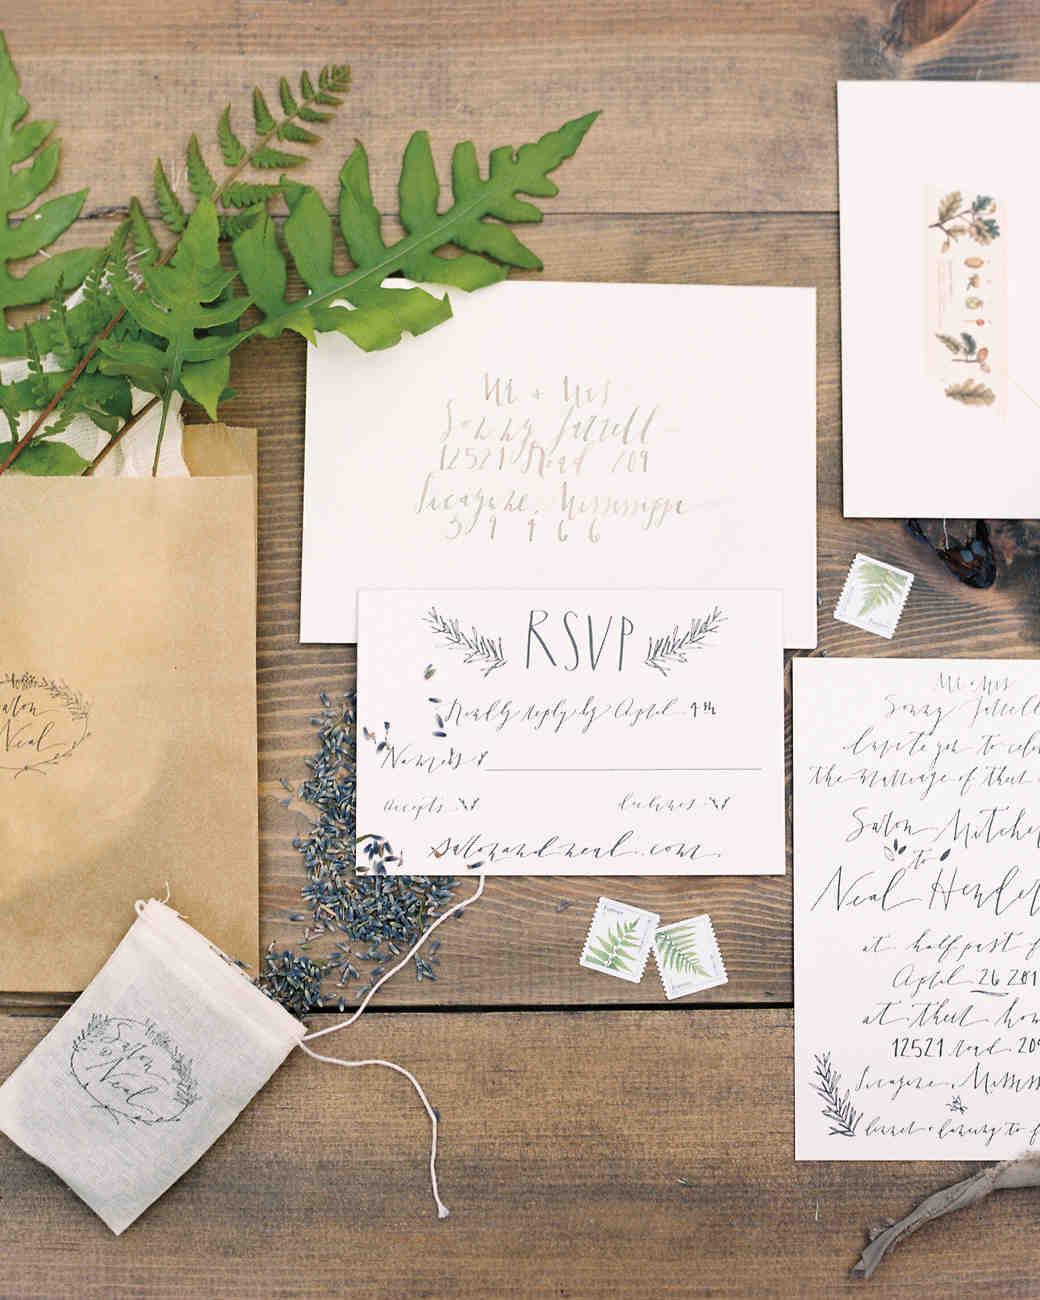 saron-neal-wedding-mississippi-00211-s111701.jpg